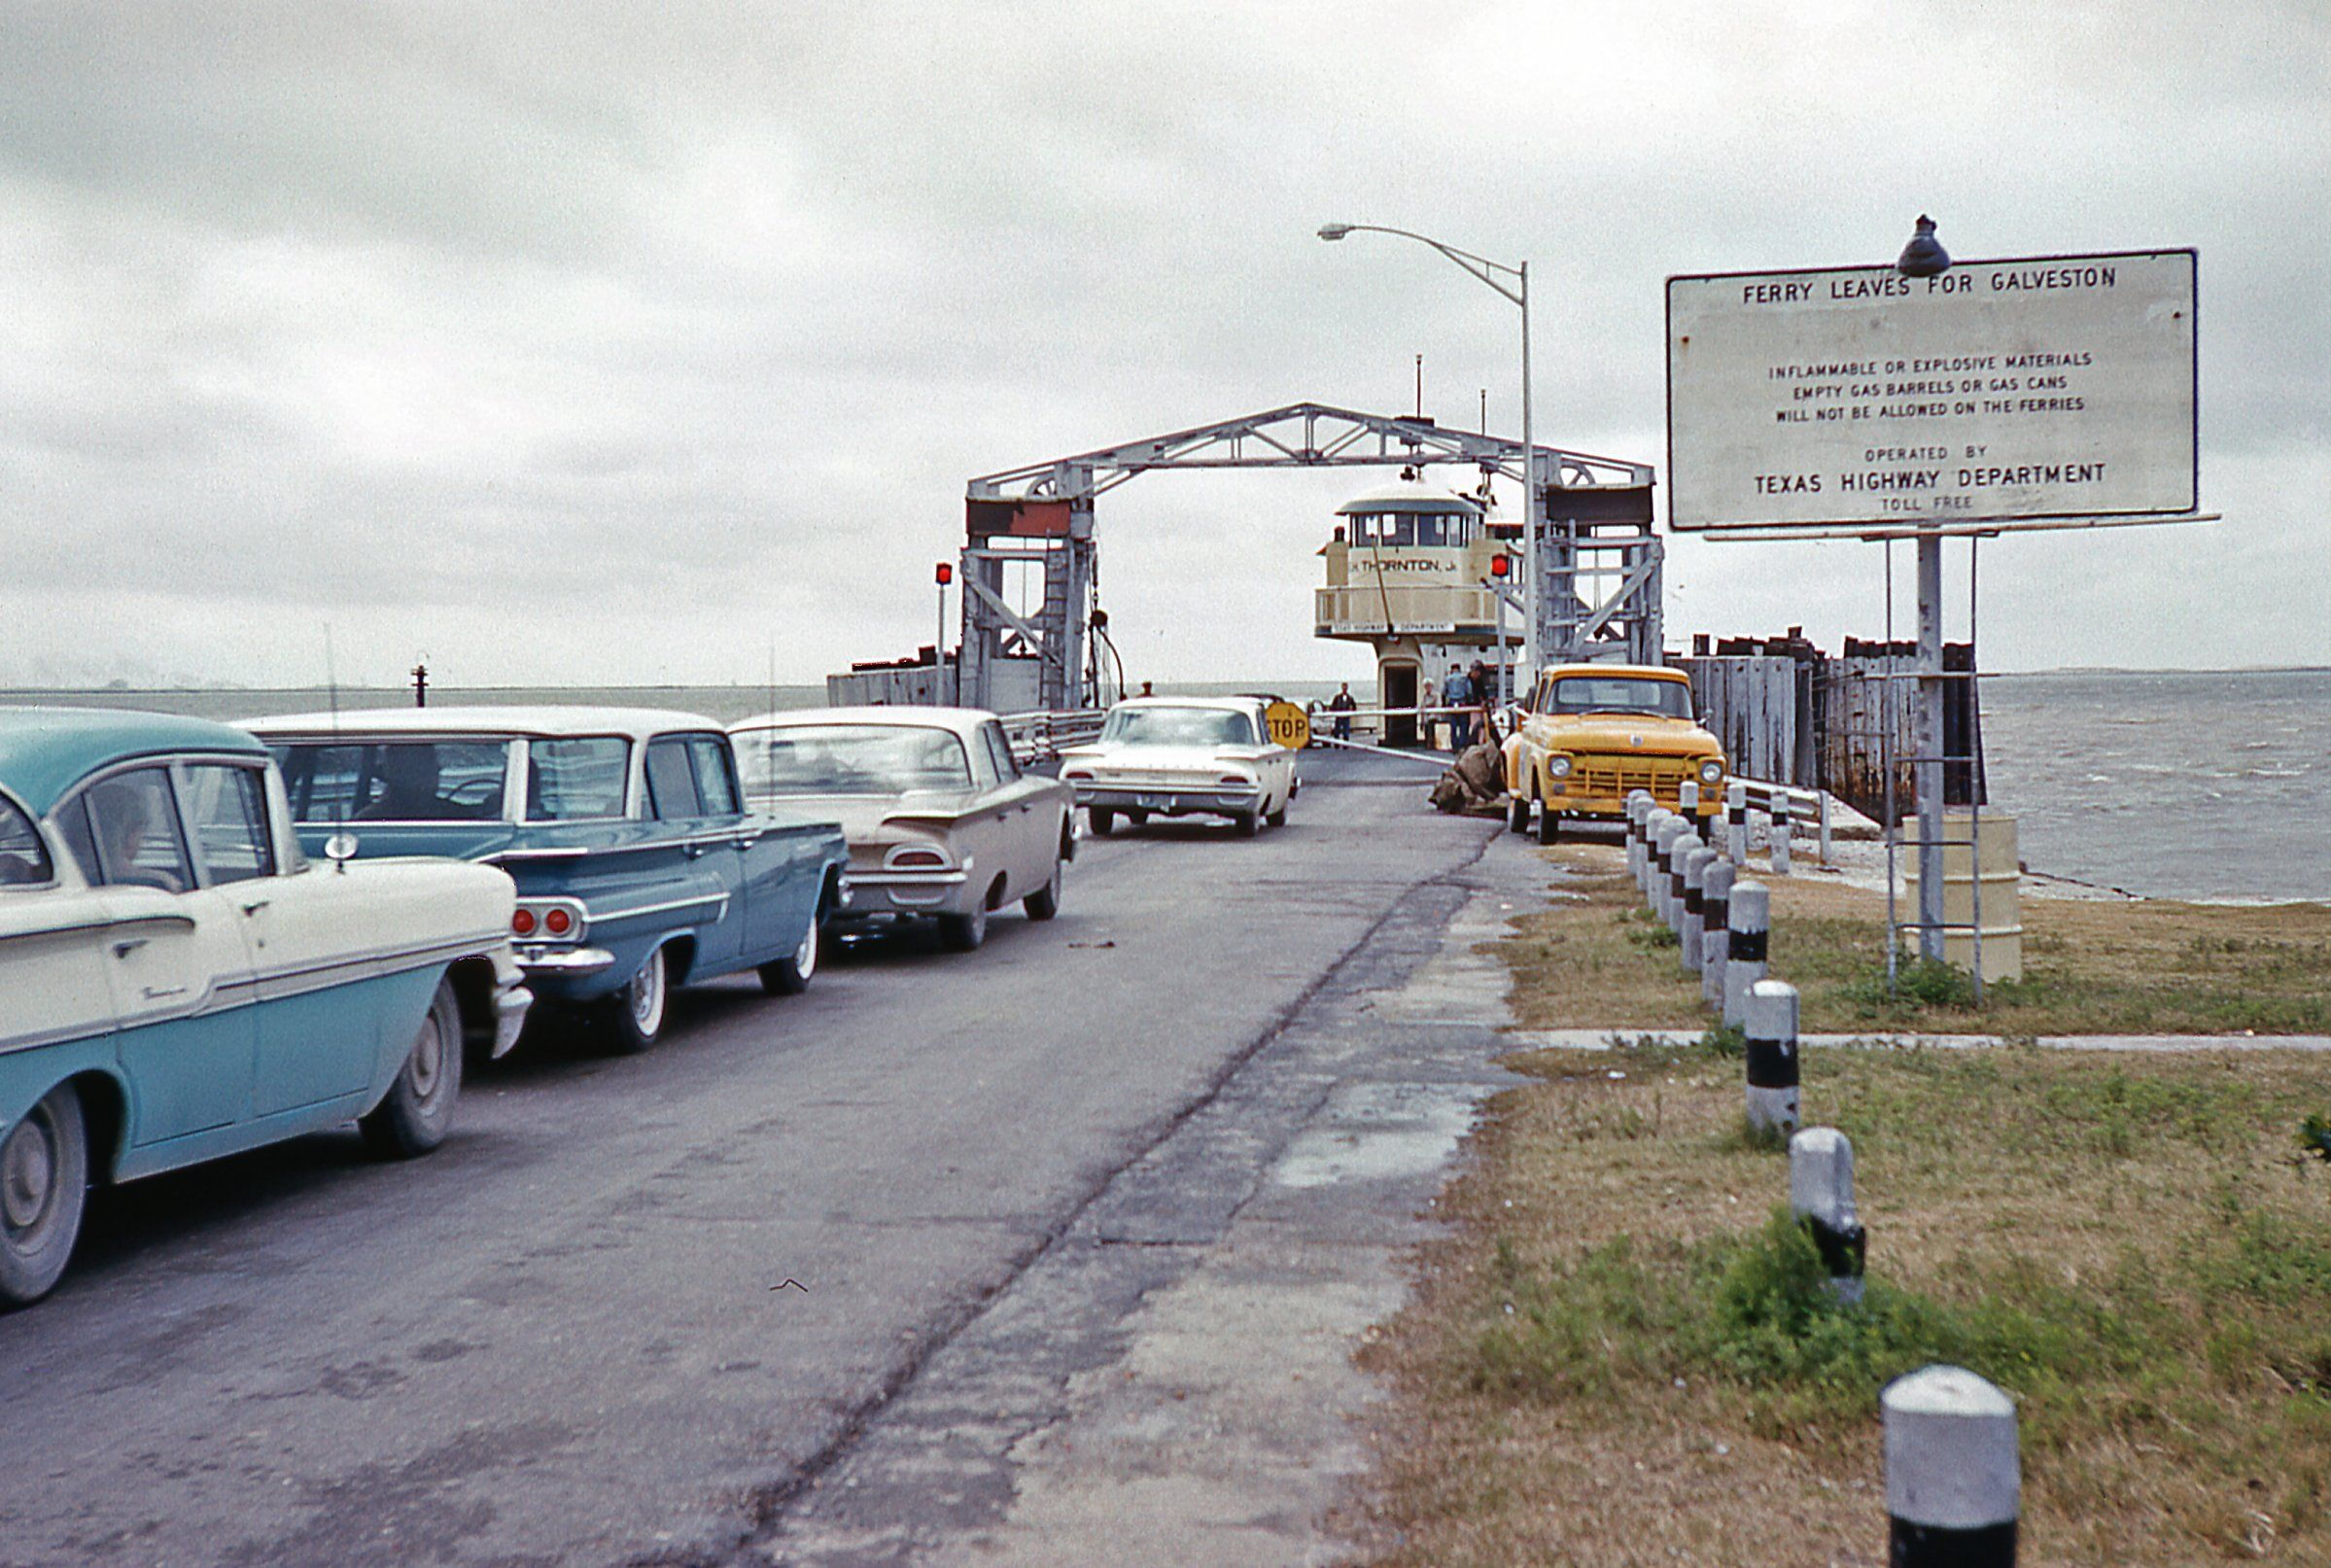 Galveston ferry november 1960 galveston texas 1960 for Houston fishing charters